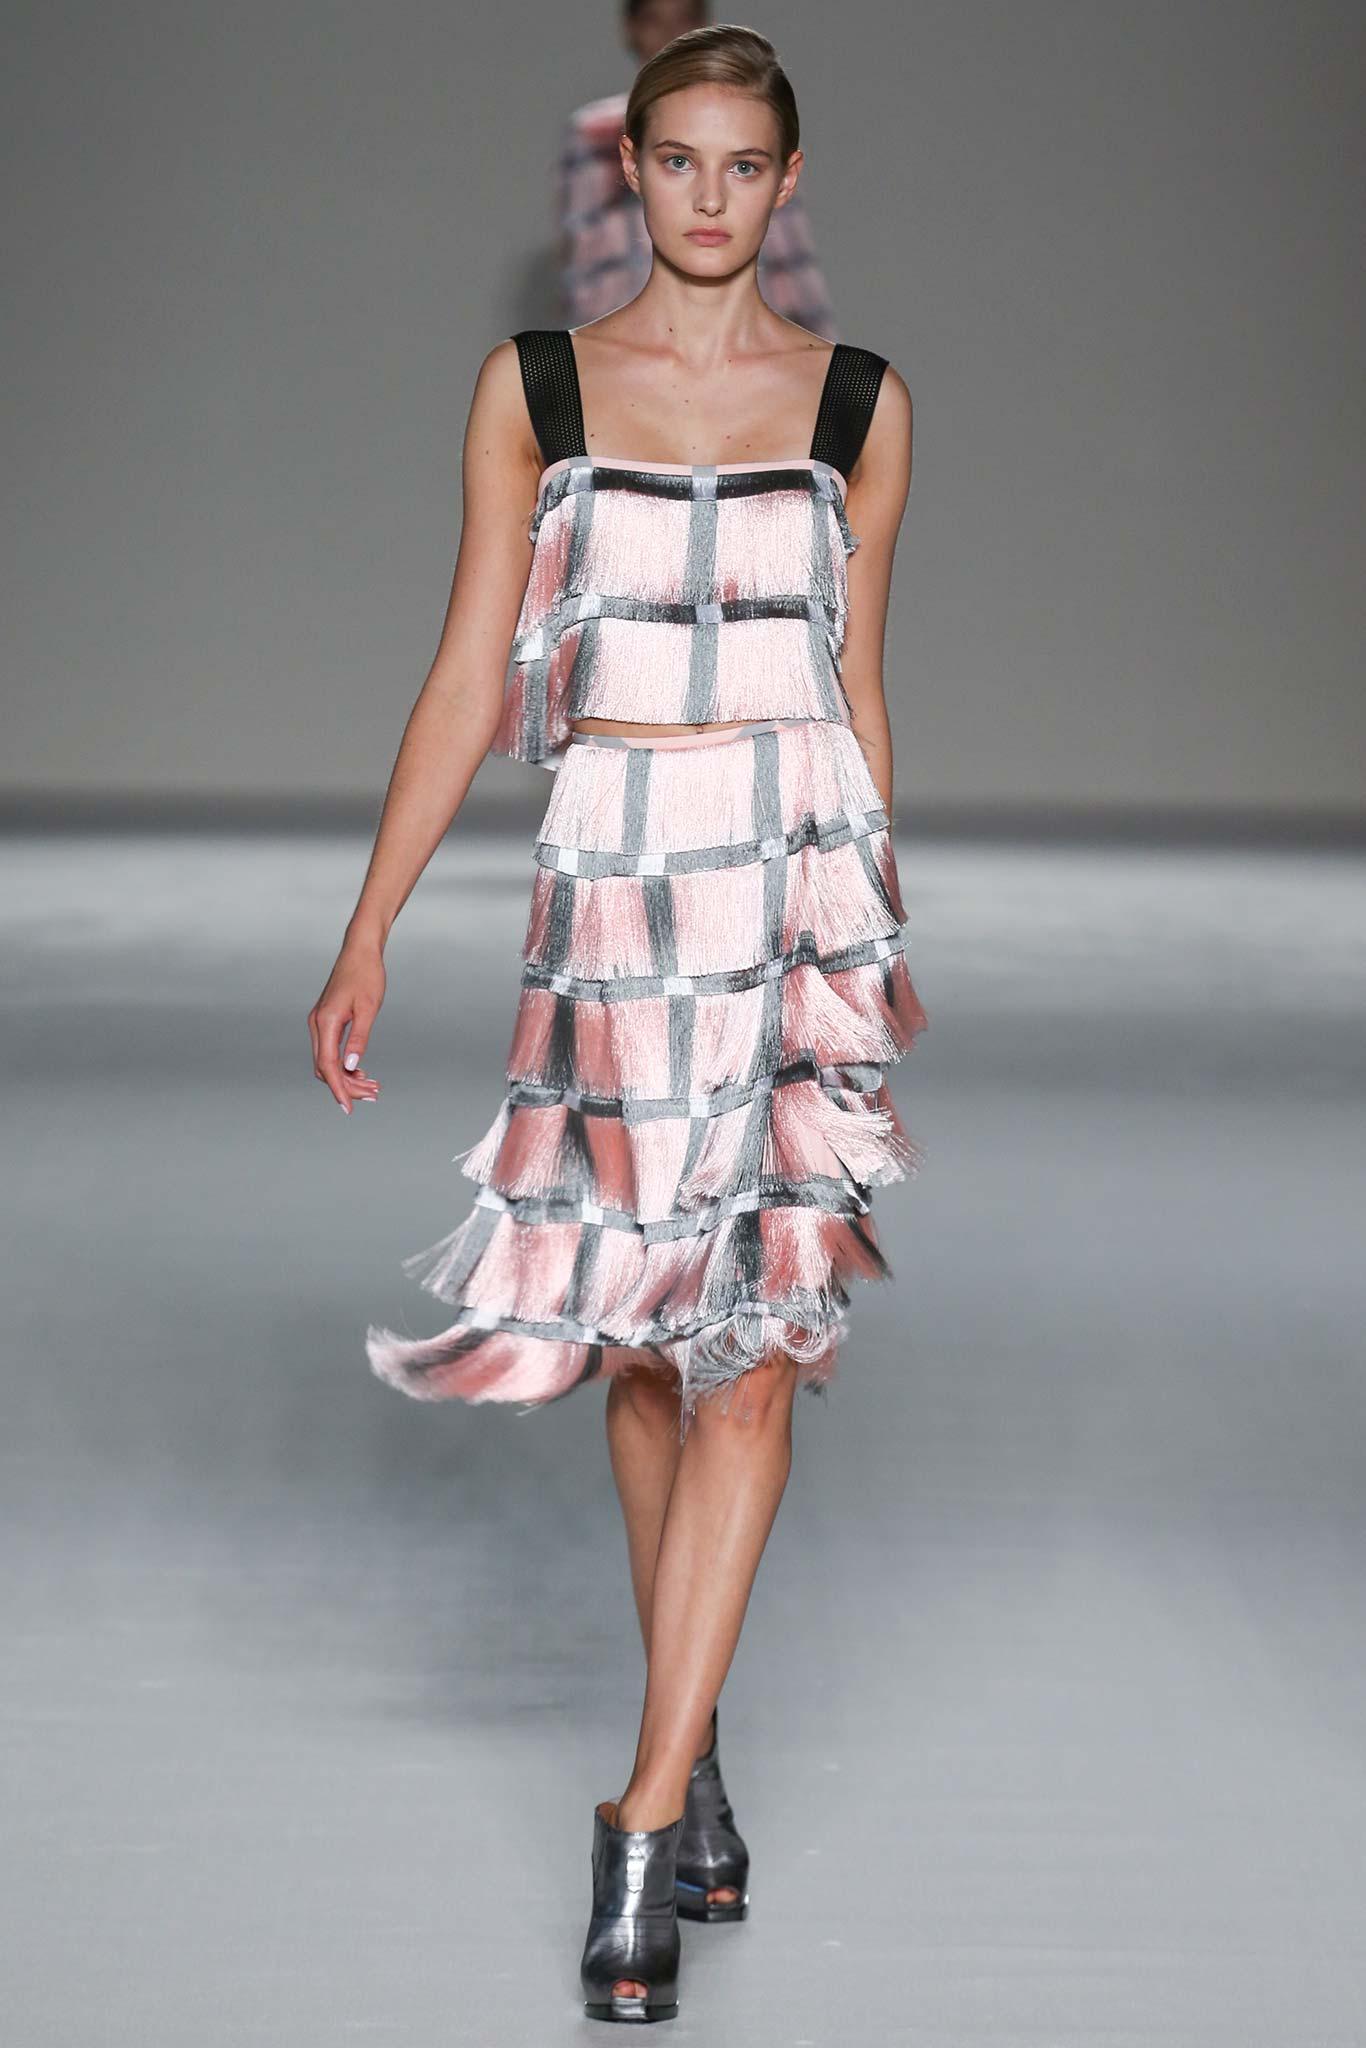 Milan Fashion Week Spring 2015 Rtw Marco De Vincenzo Ani Izzy